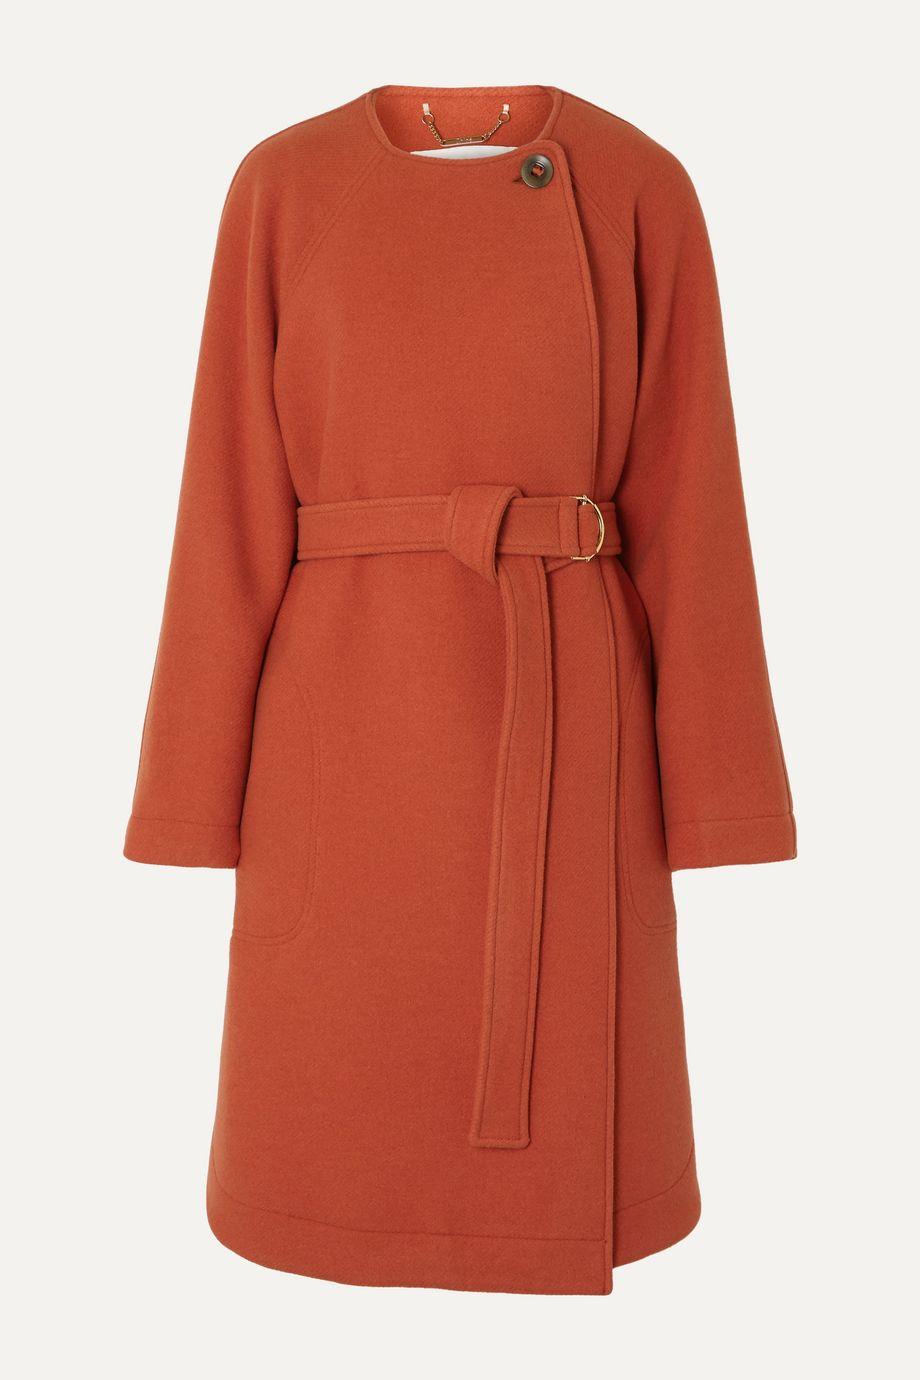 Chloé Belted wool-blend felt coat